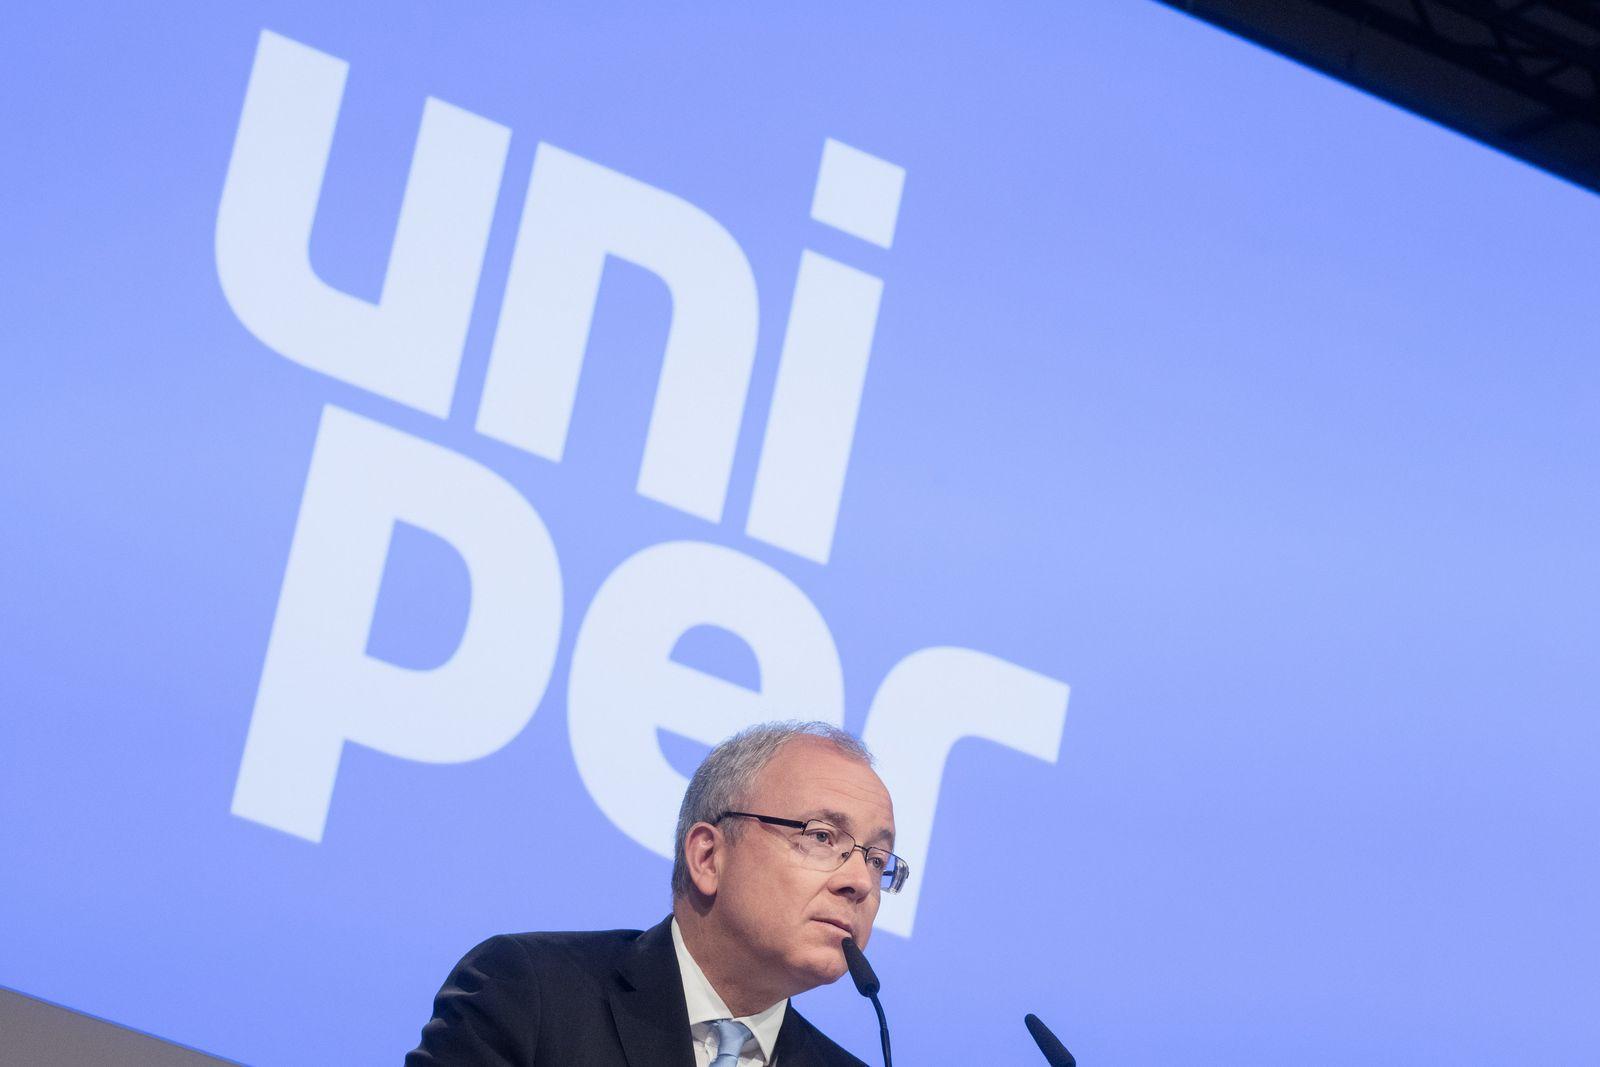 Uniper / Christopher Delbrück